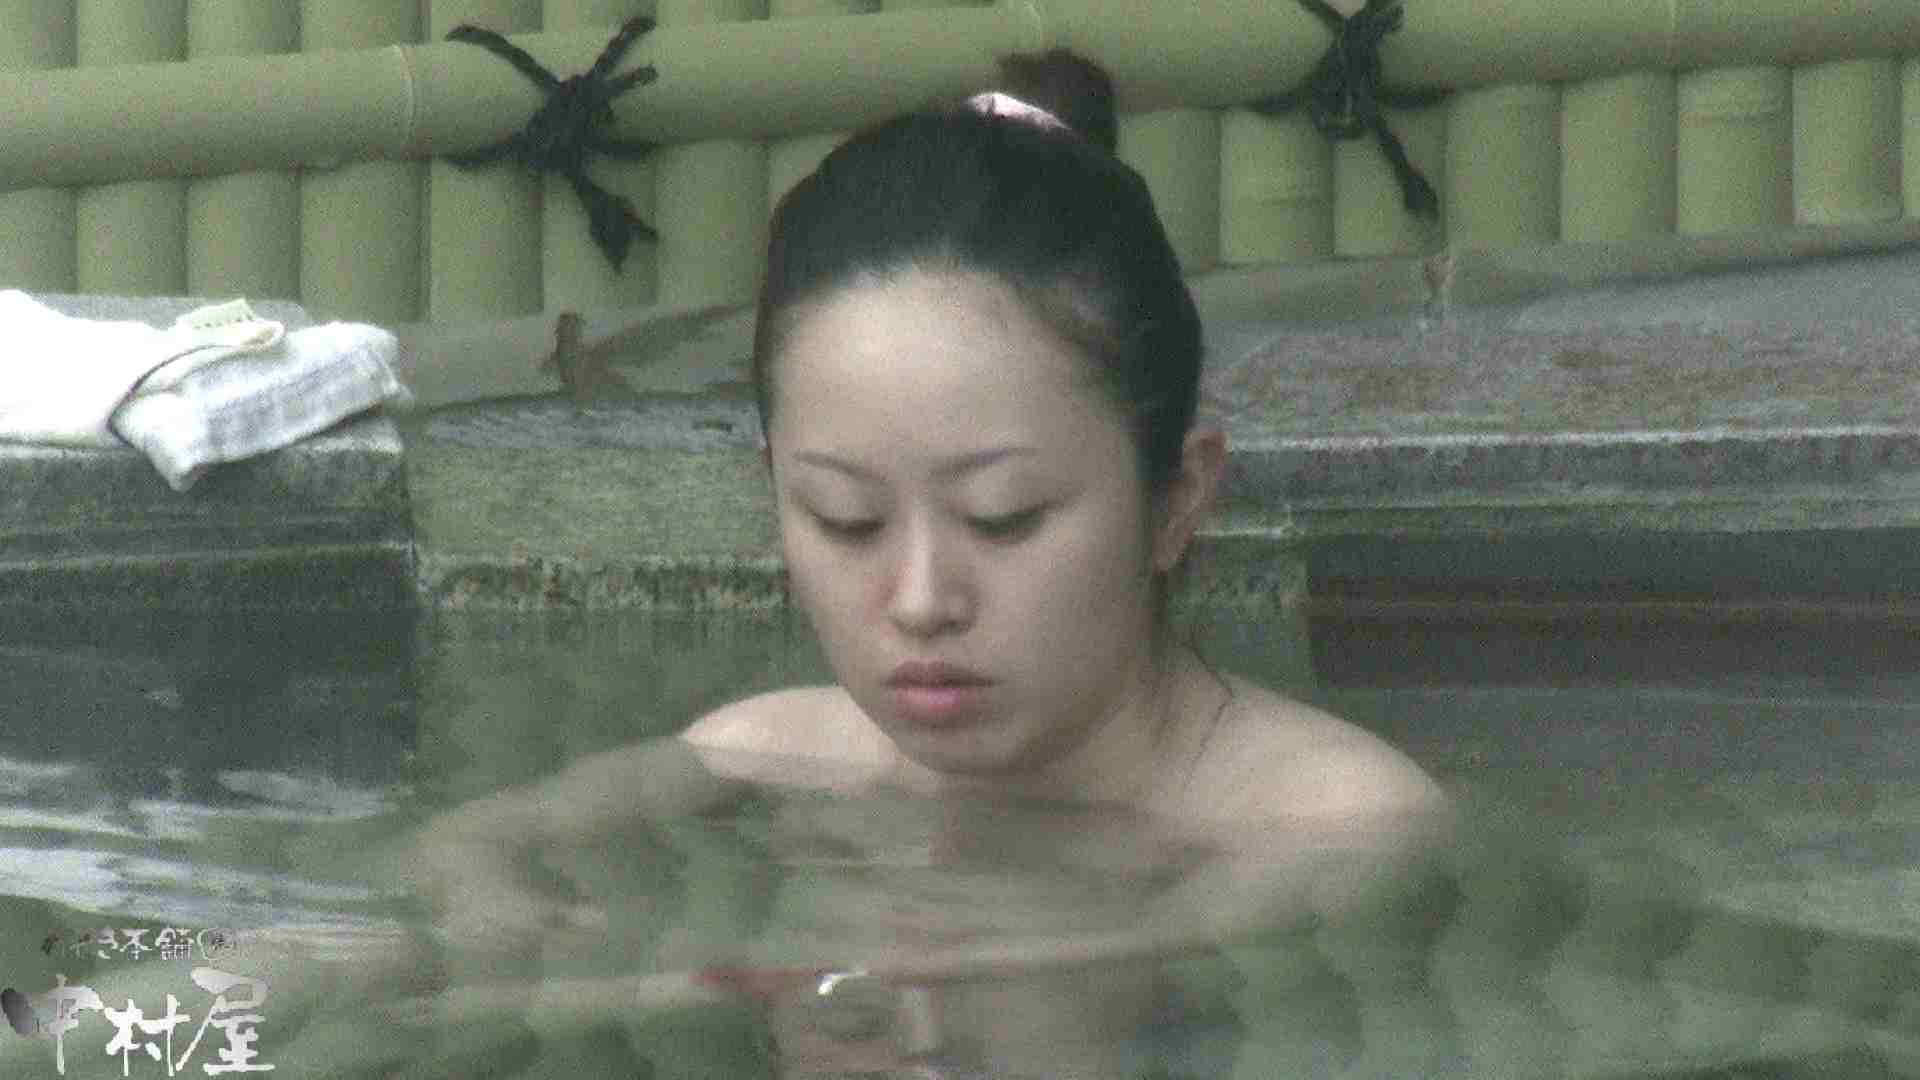 Aquaな露天風呂Vol.912 OLセックス  62画像 36